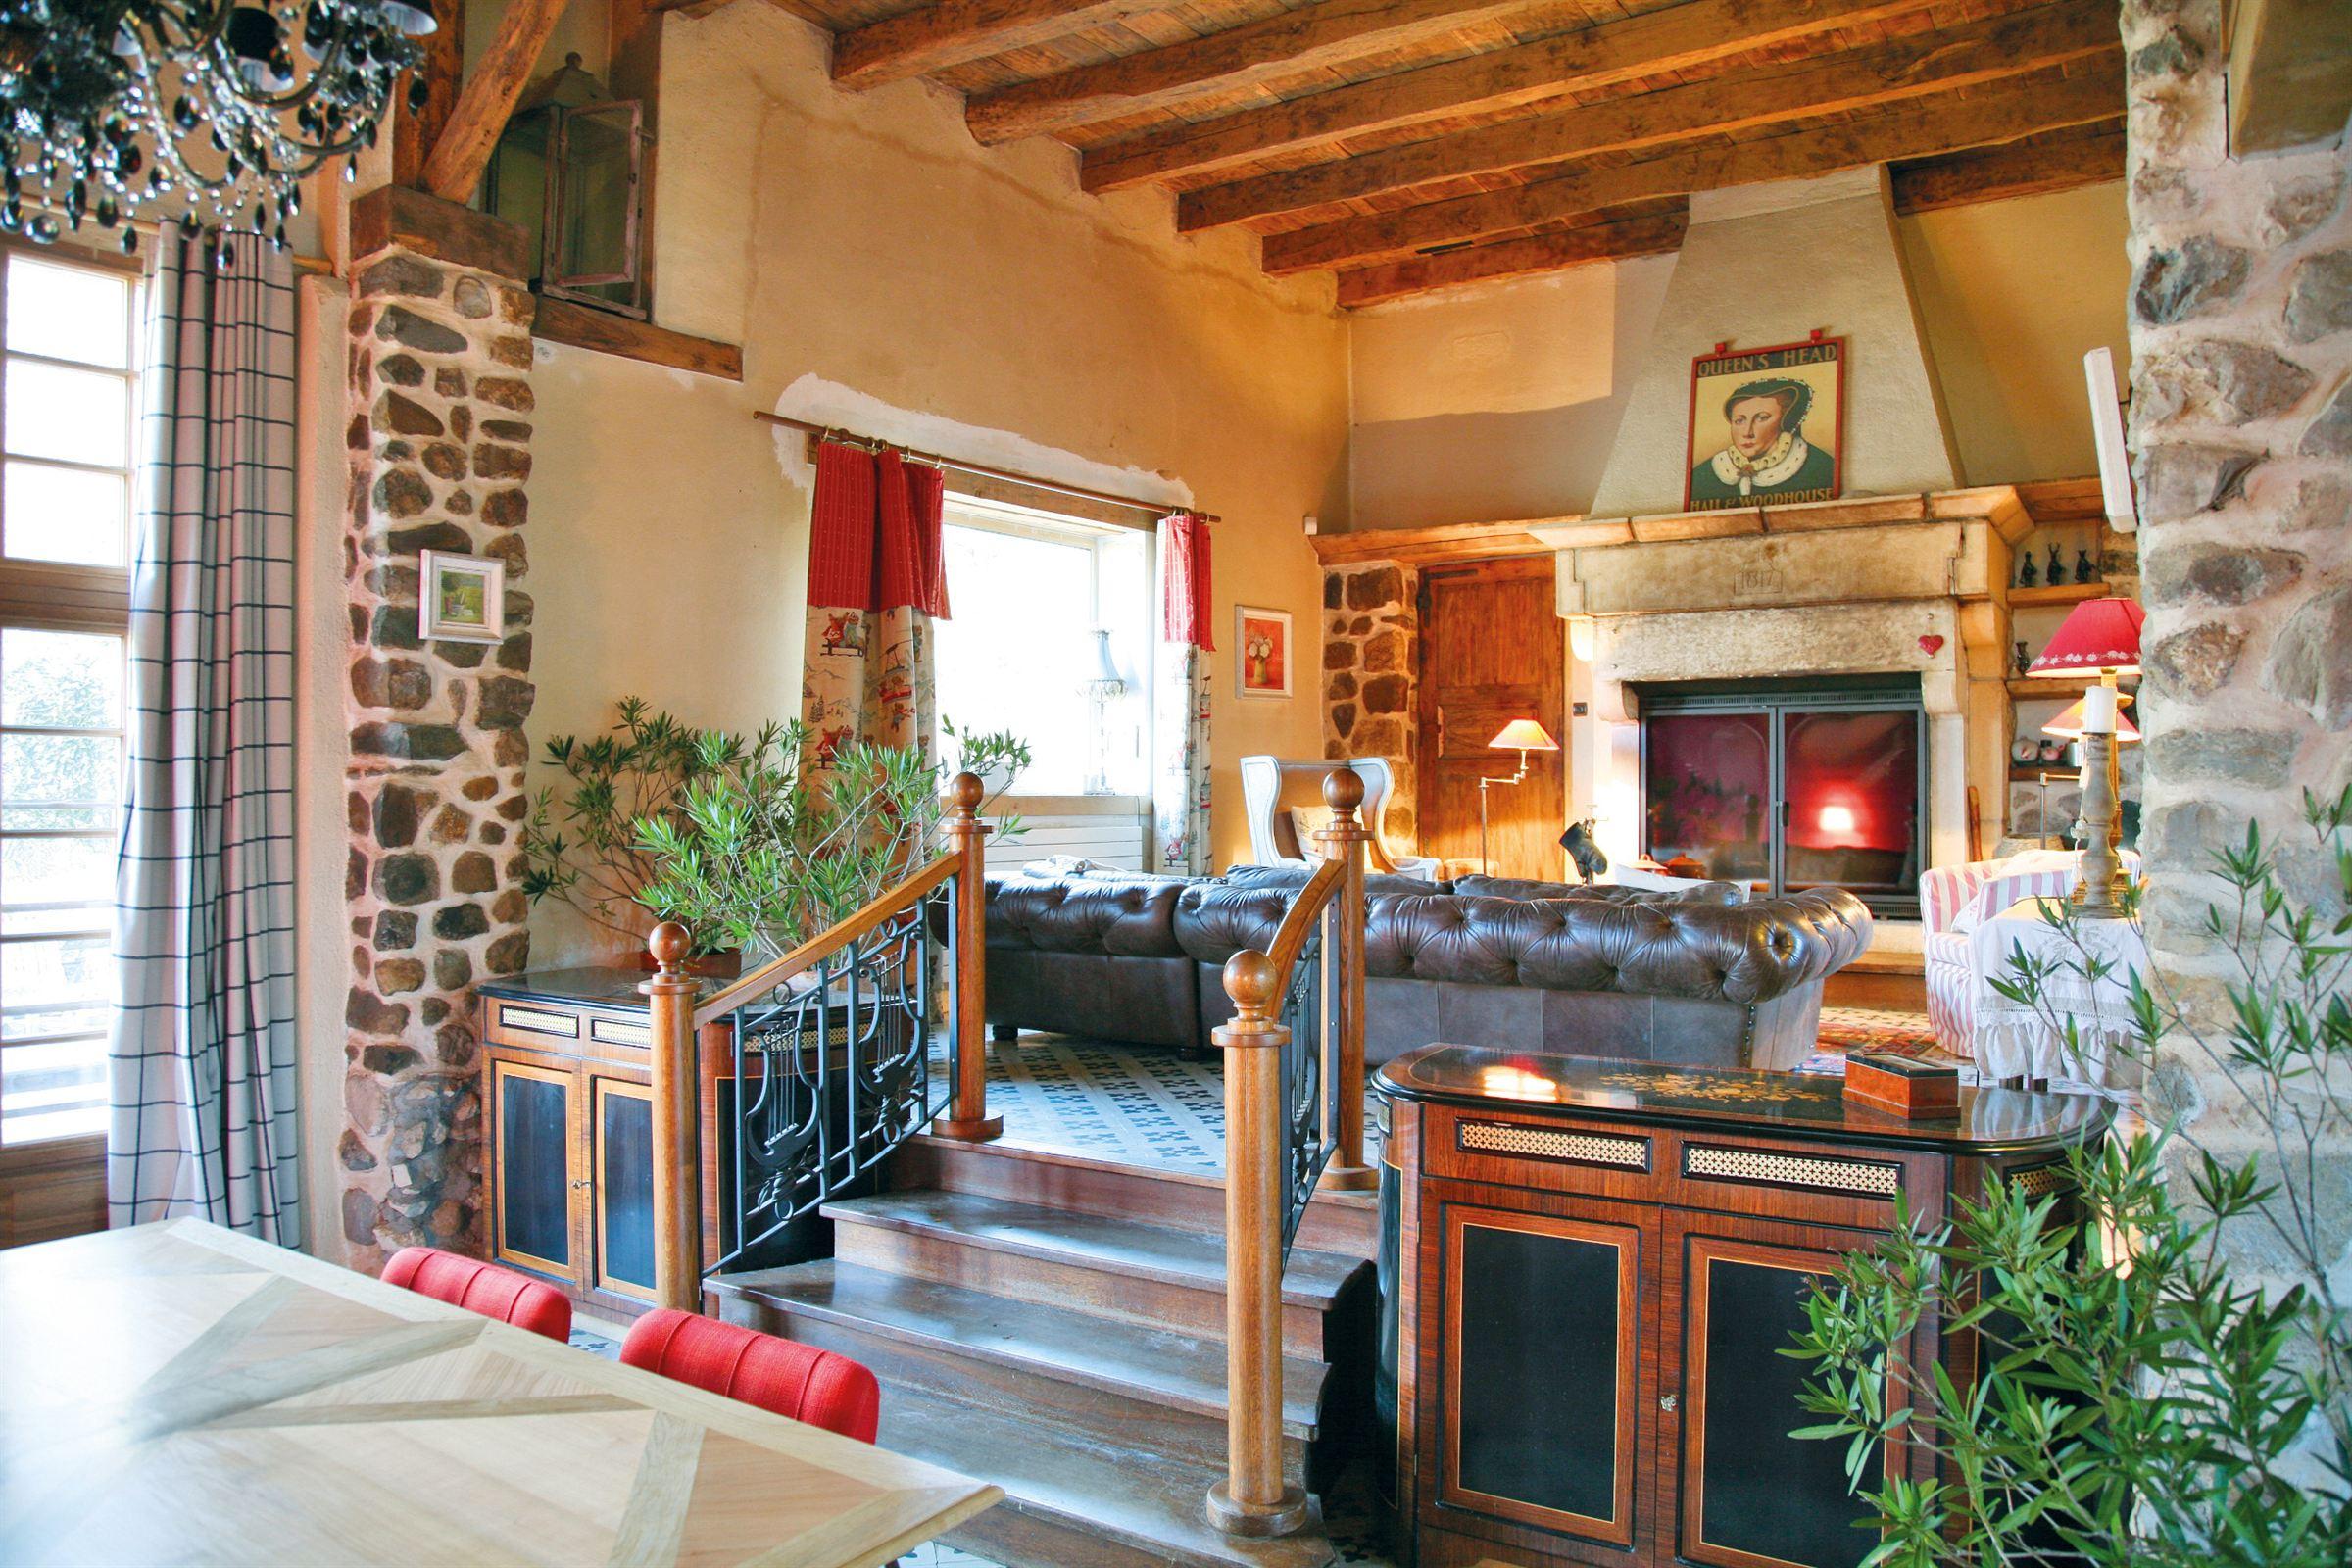 Moradia para Venda às Property Other Rhone-Alpes, Rhone-Alpes, 74540 França